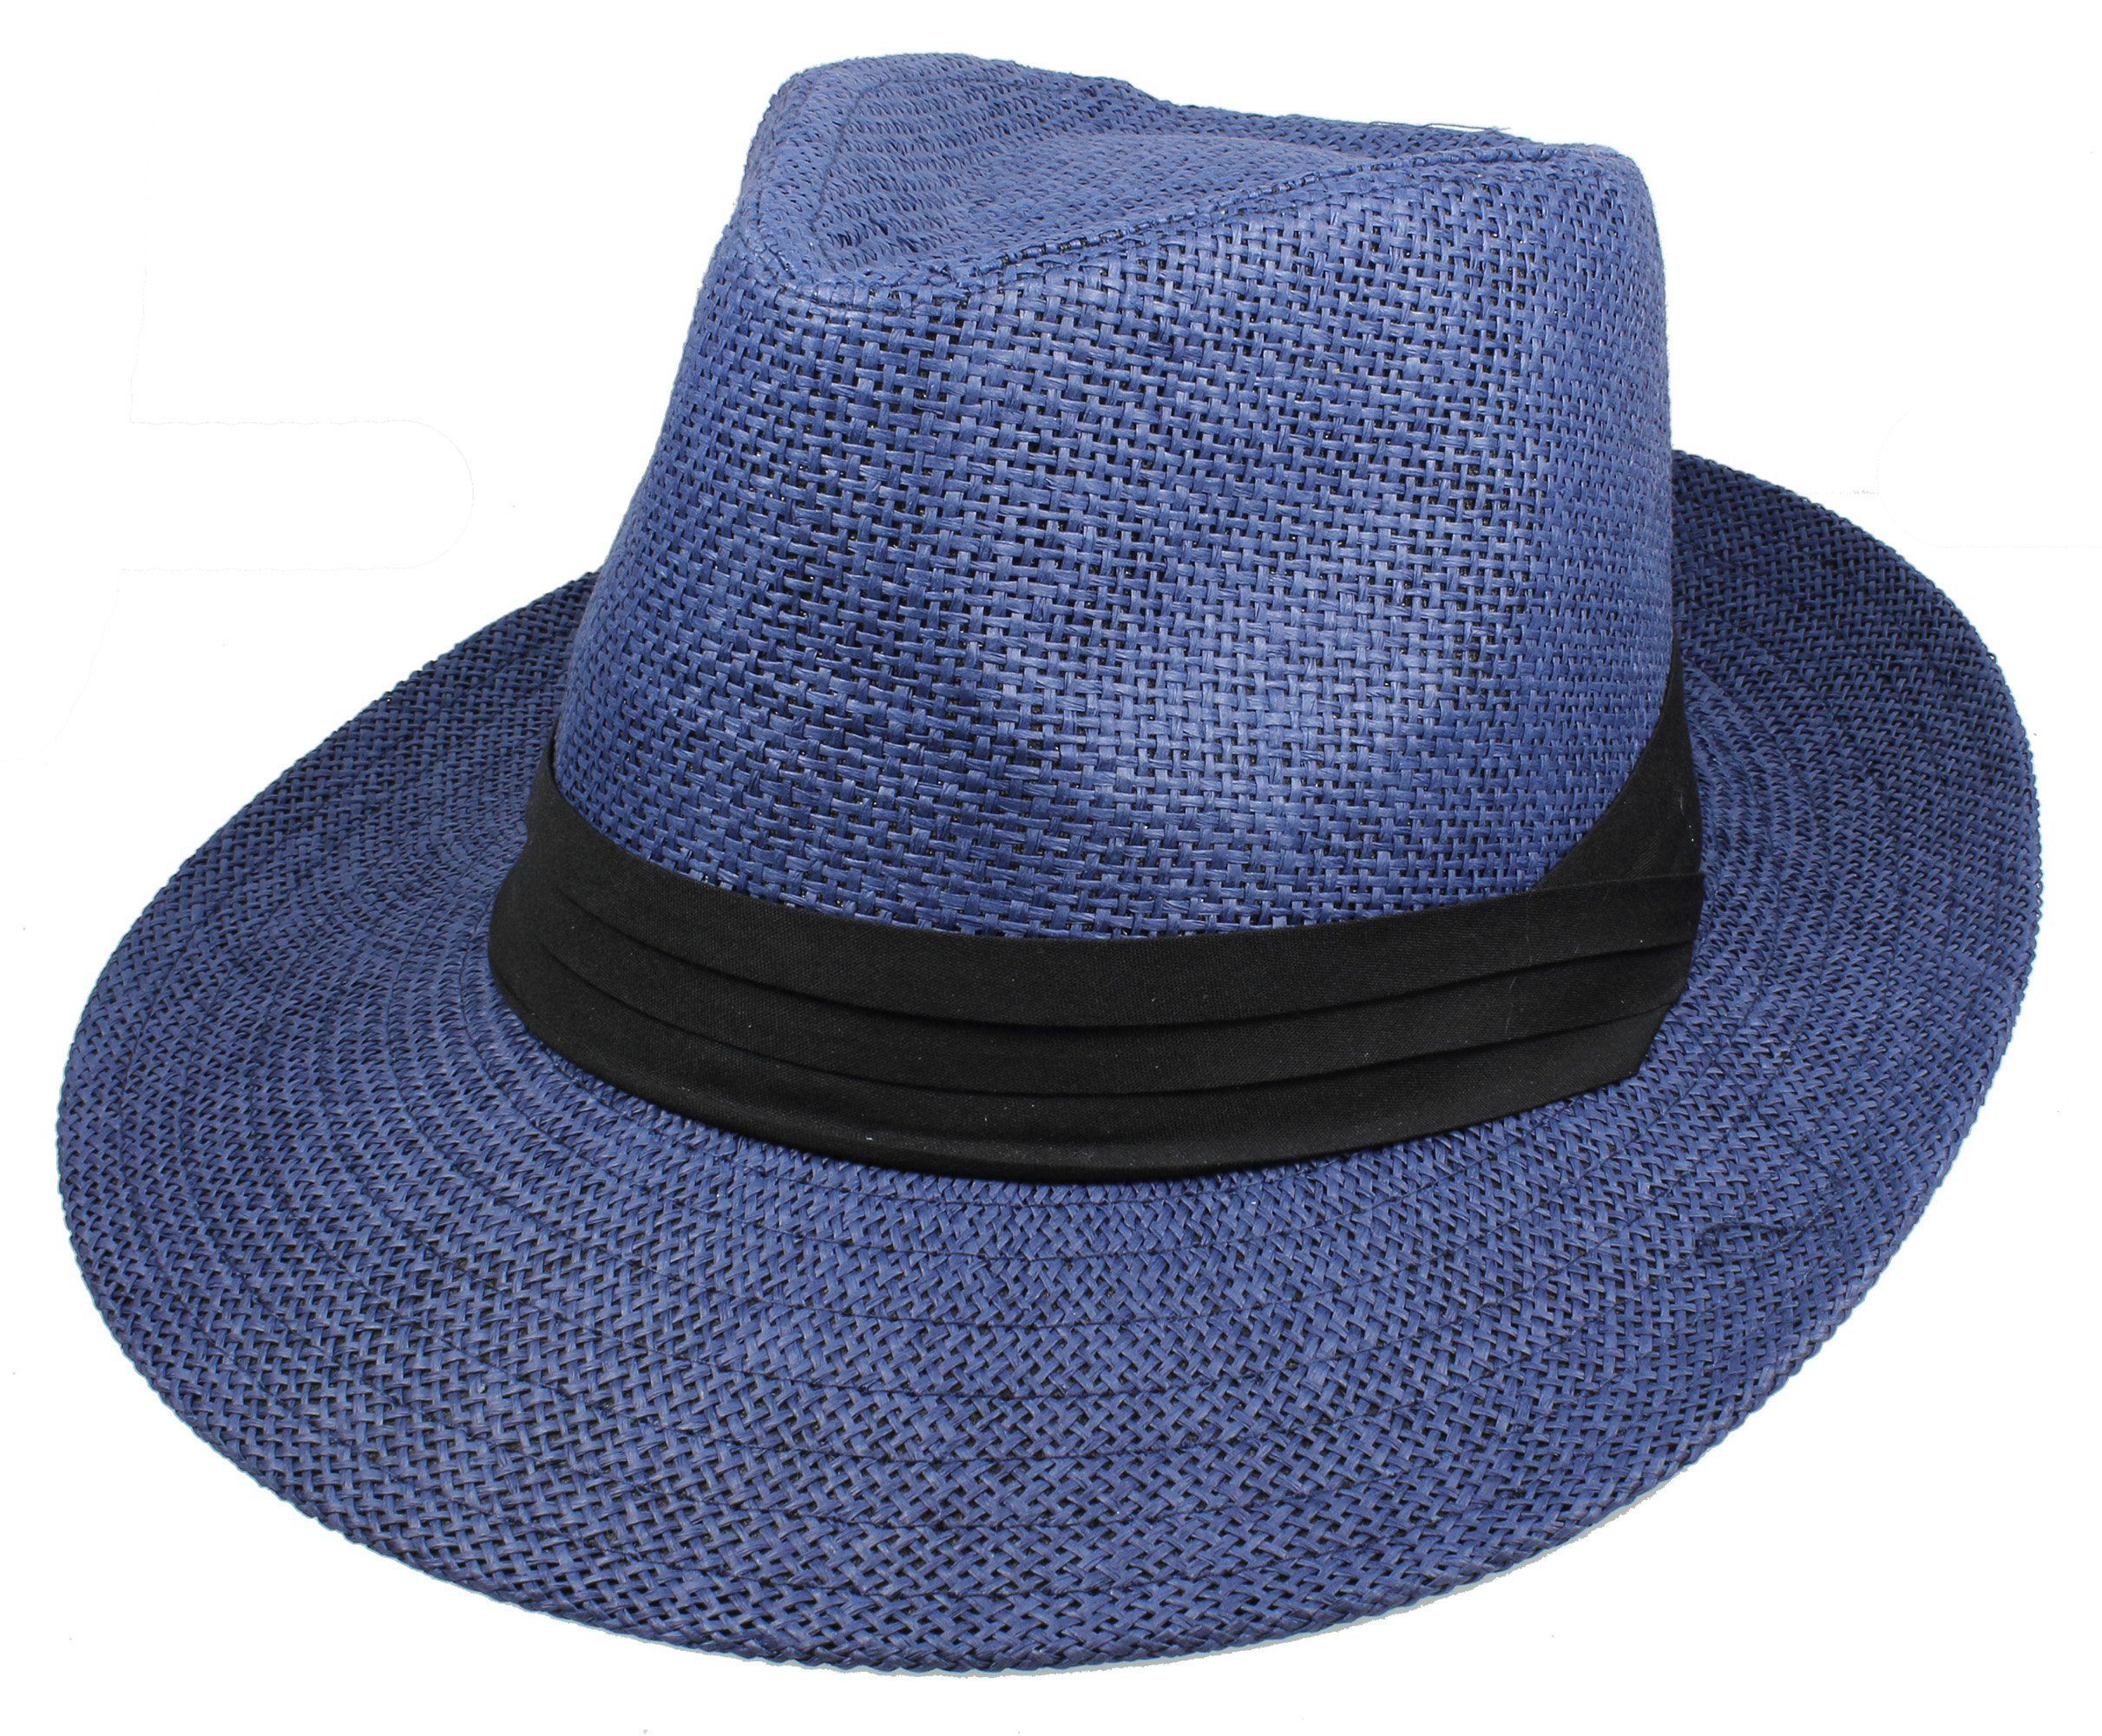 Gelante Wide Brim Summer Fedora Panama Straw Hats with Black Band M255-Navy-L/XL